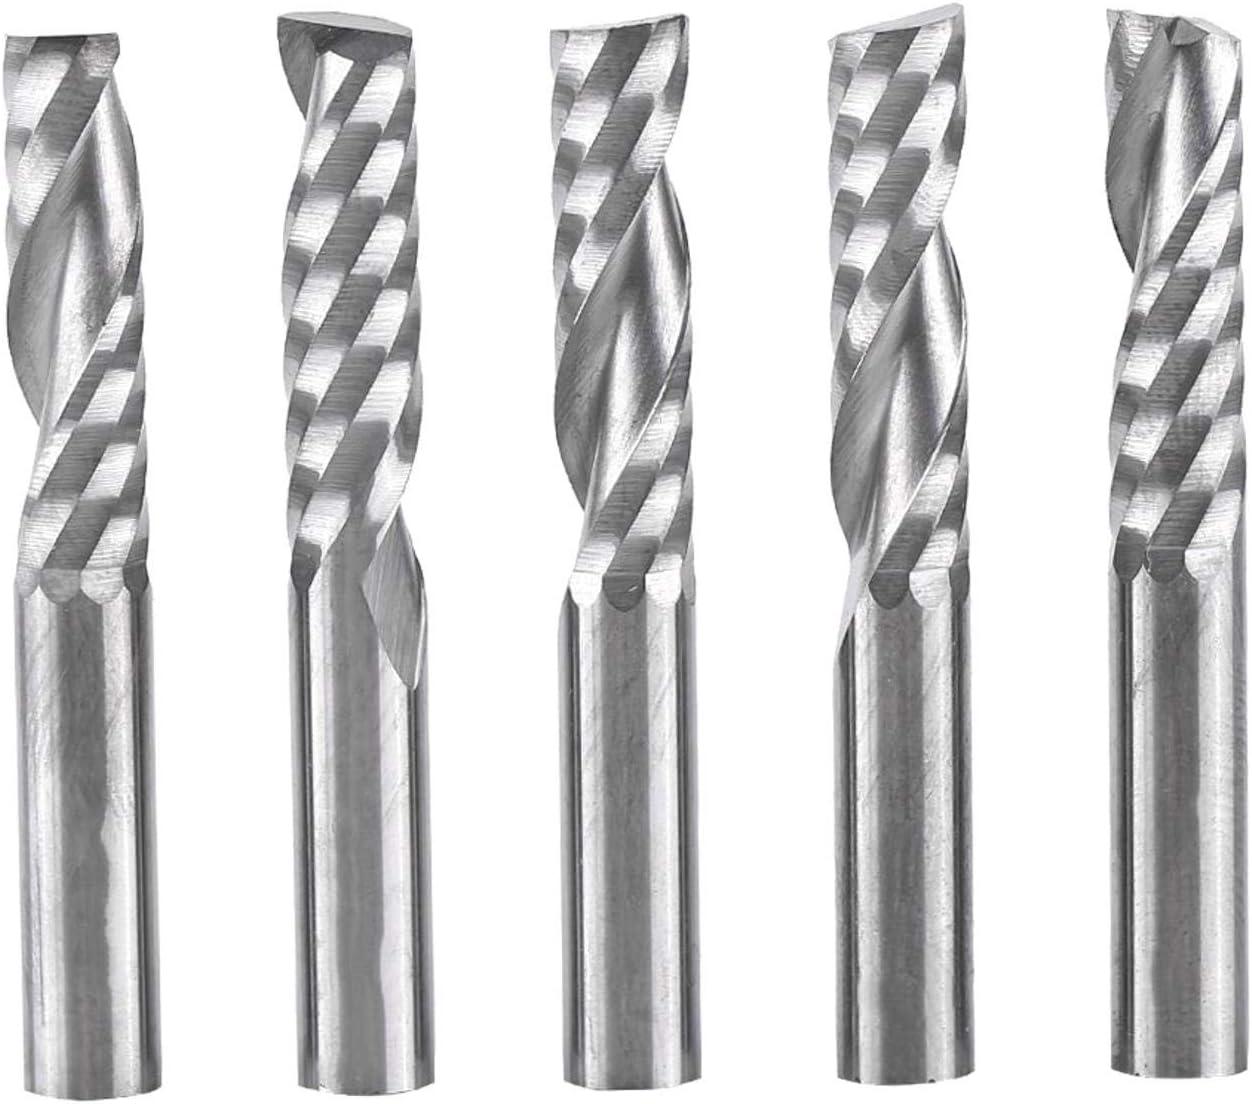 CLTYQ 5pcs Frese 6mm a Spirale taglierina fresatura CNC Bit Shank carburo di tungsteno Singole Flute End Mills